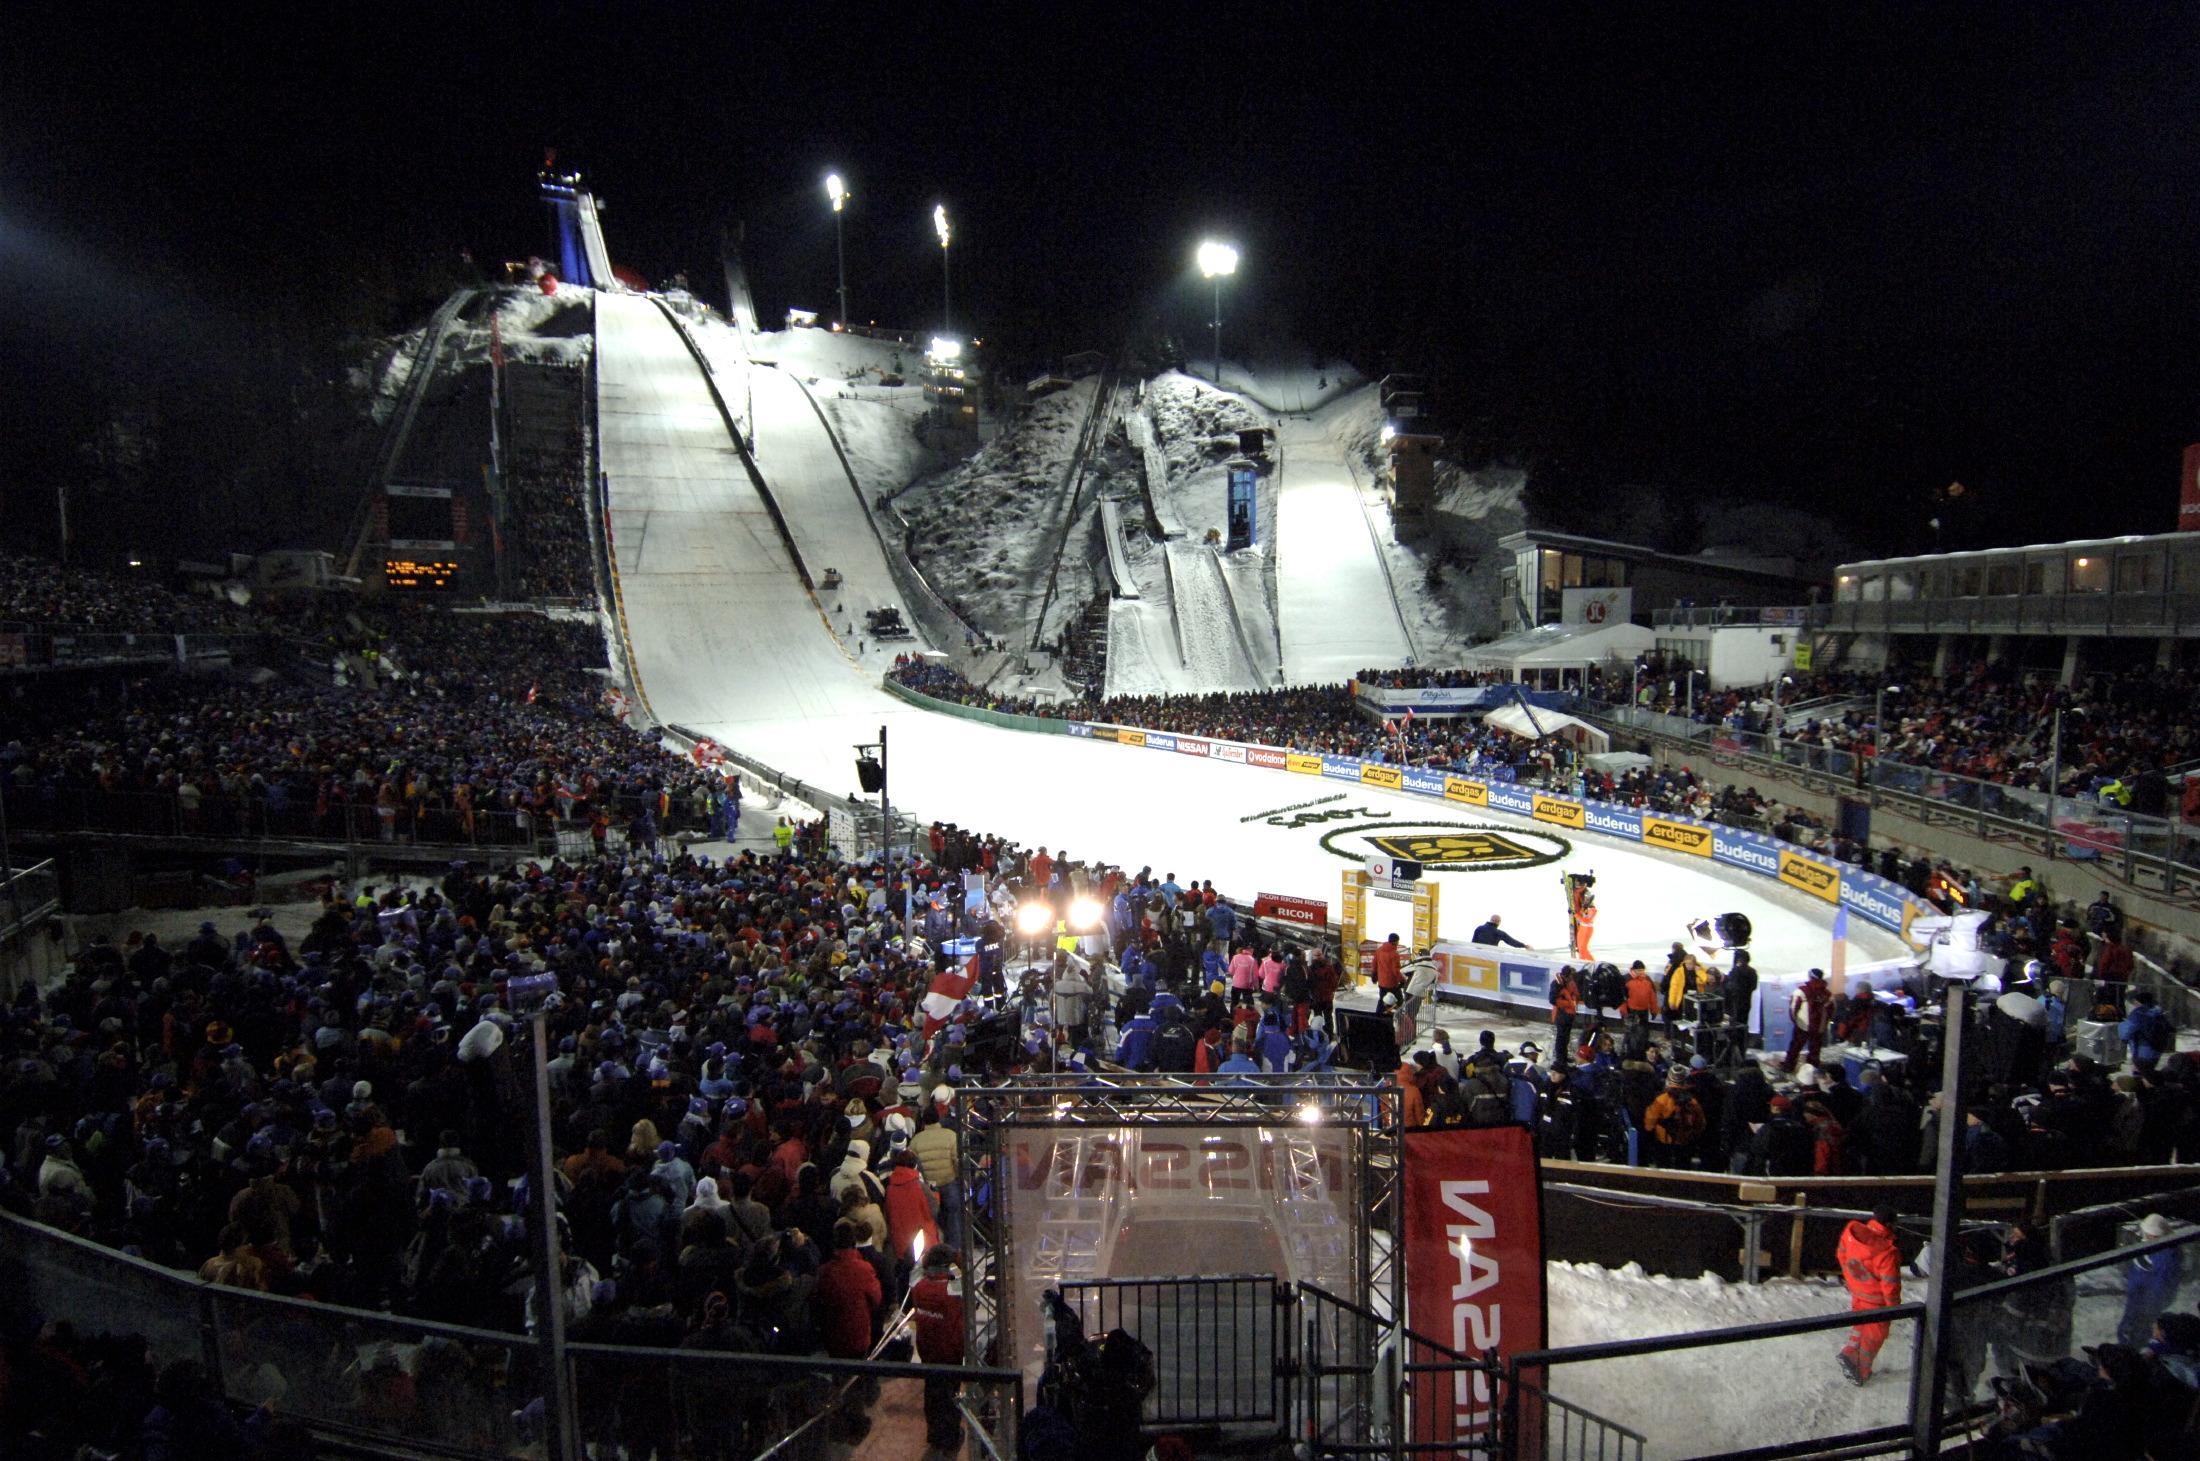 Skispringen - Audi Arena & Skiflugschanze Obestdorf